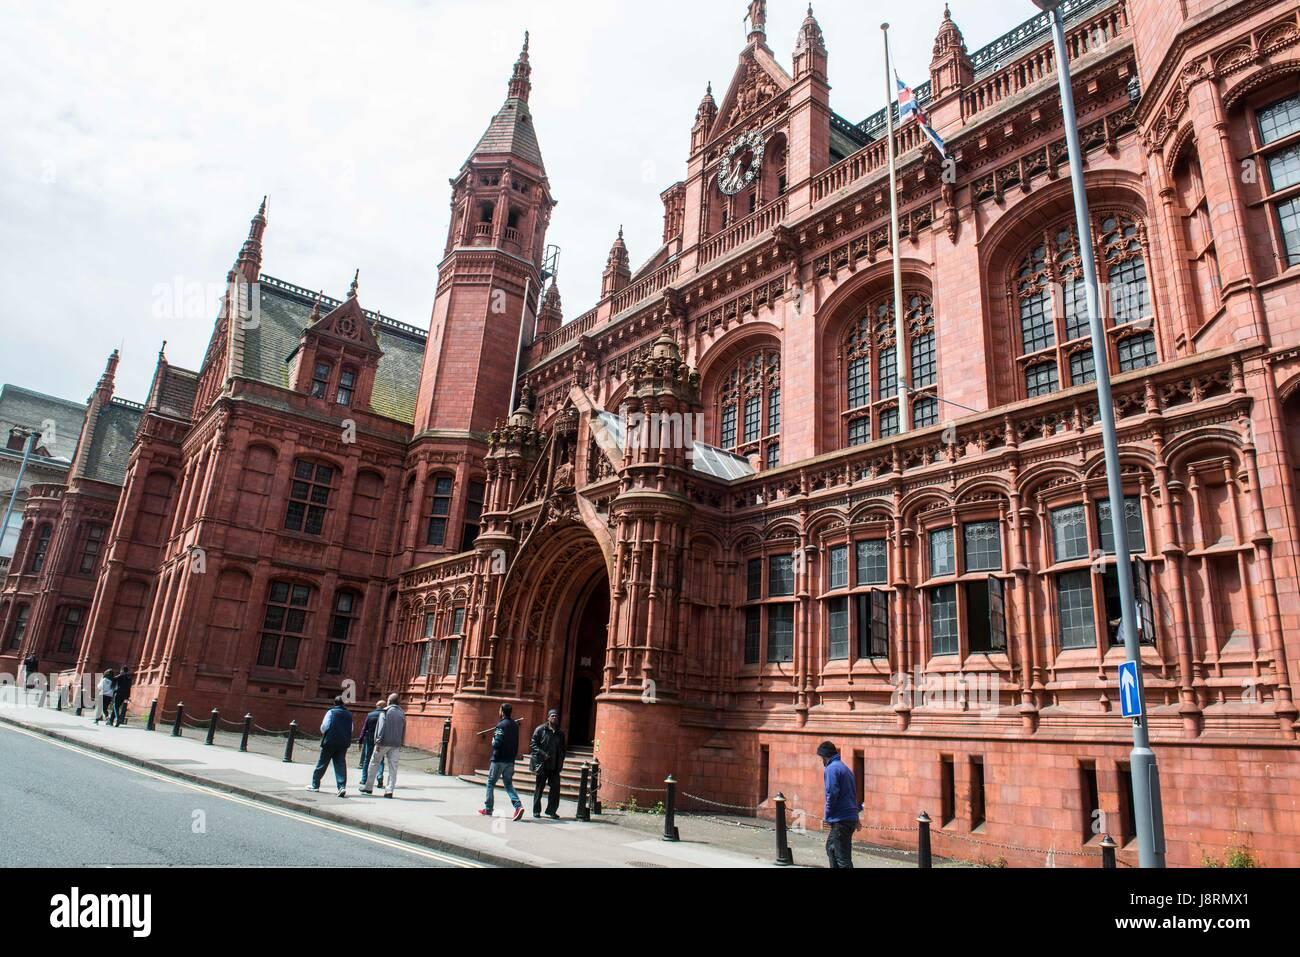 Birmingham Magistrates Court Building Stock Photo Alamy